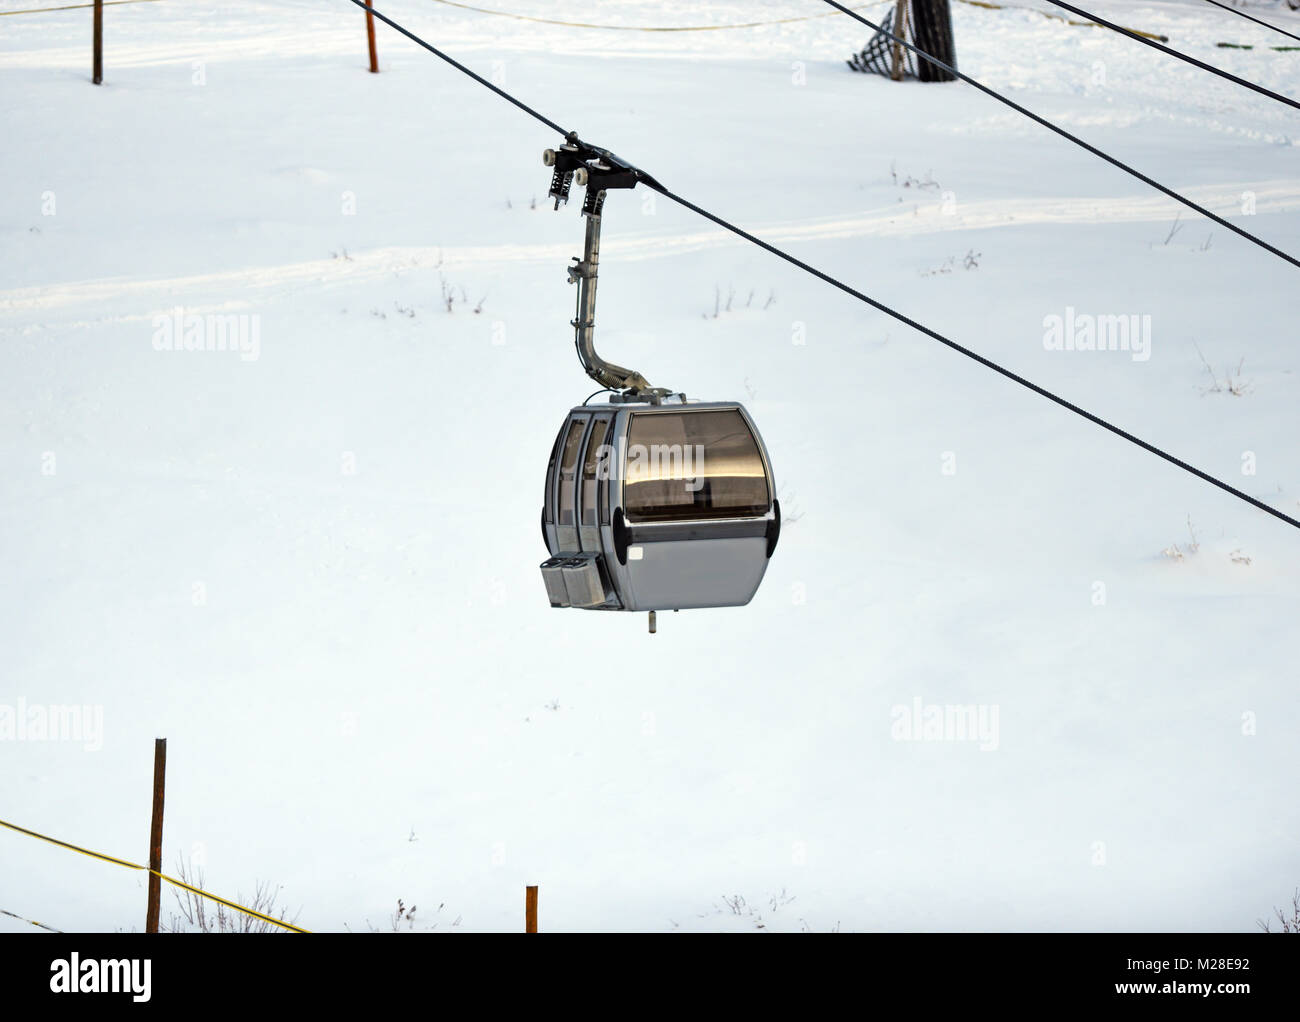 Gondola at ski resort with white snow in winter - Stock Image